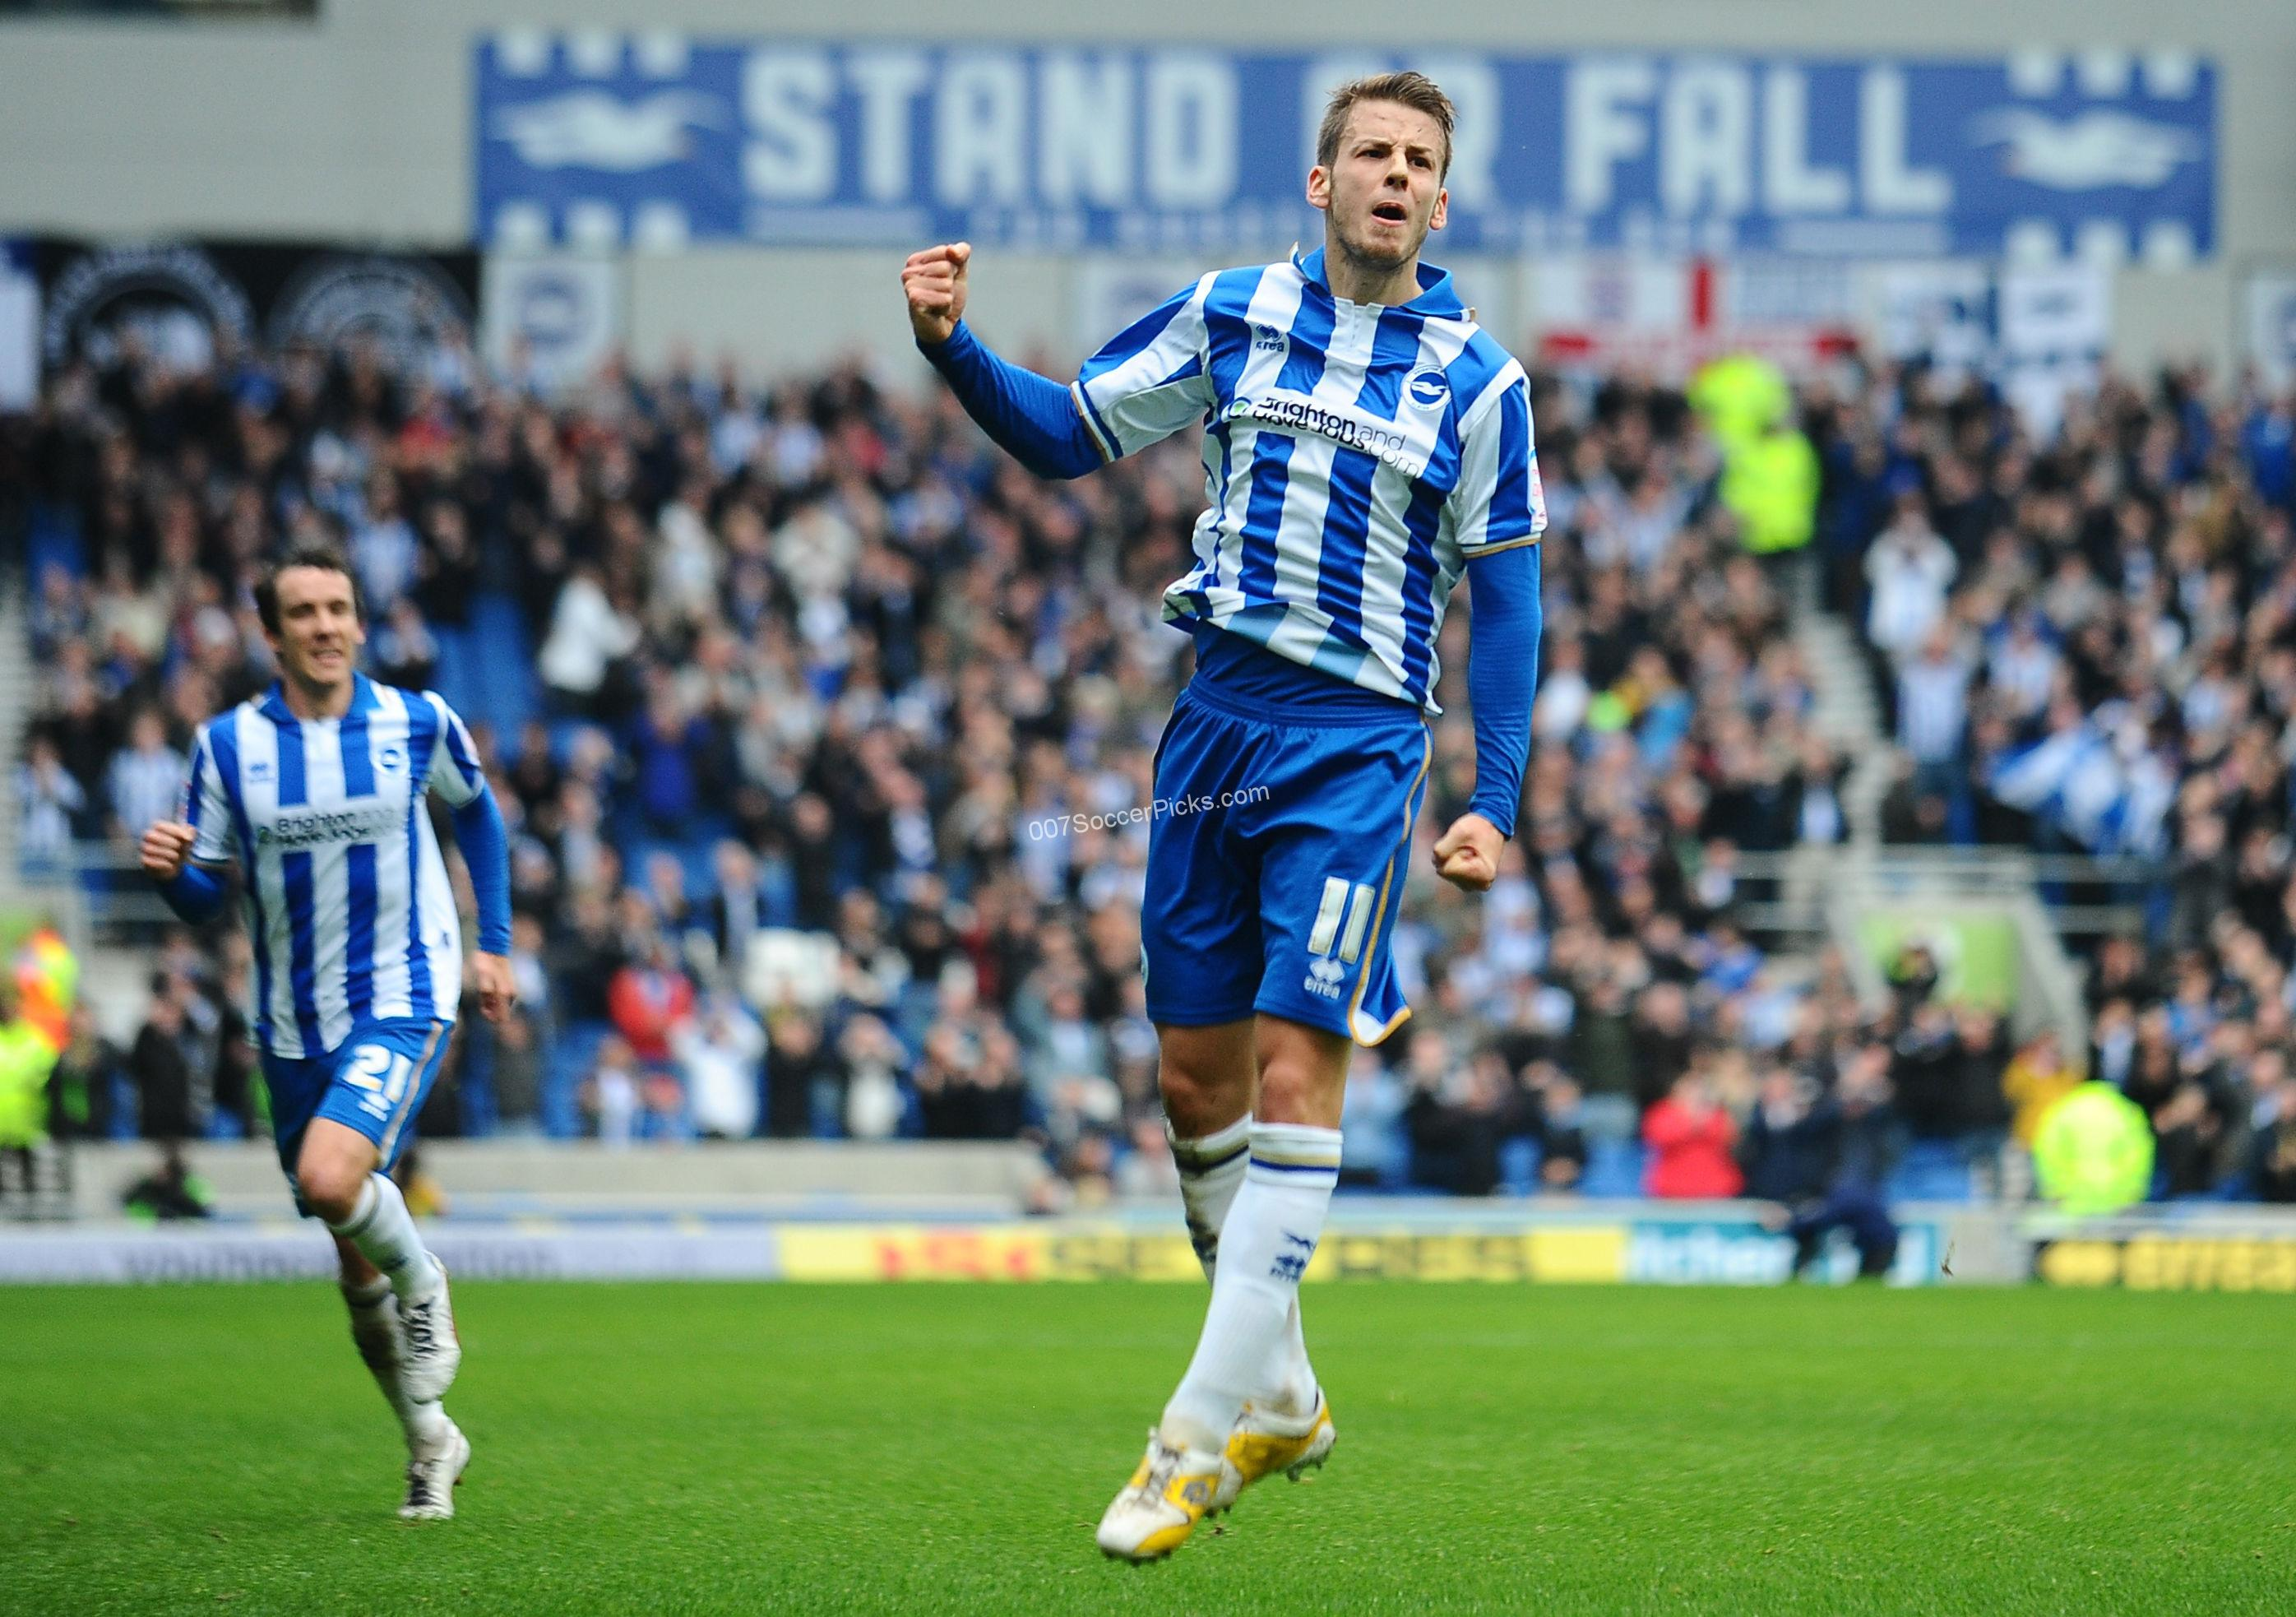 Watch Brighton Vs Aston Villa Live Streaming